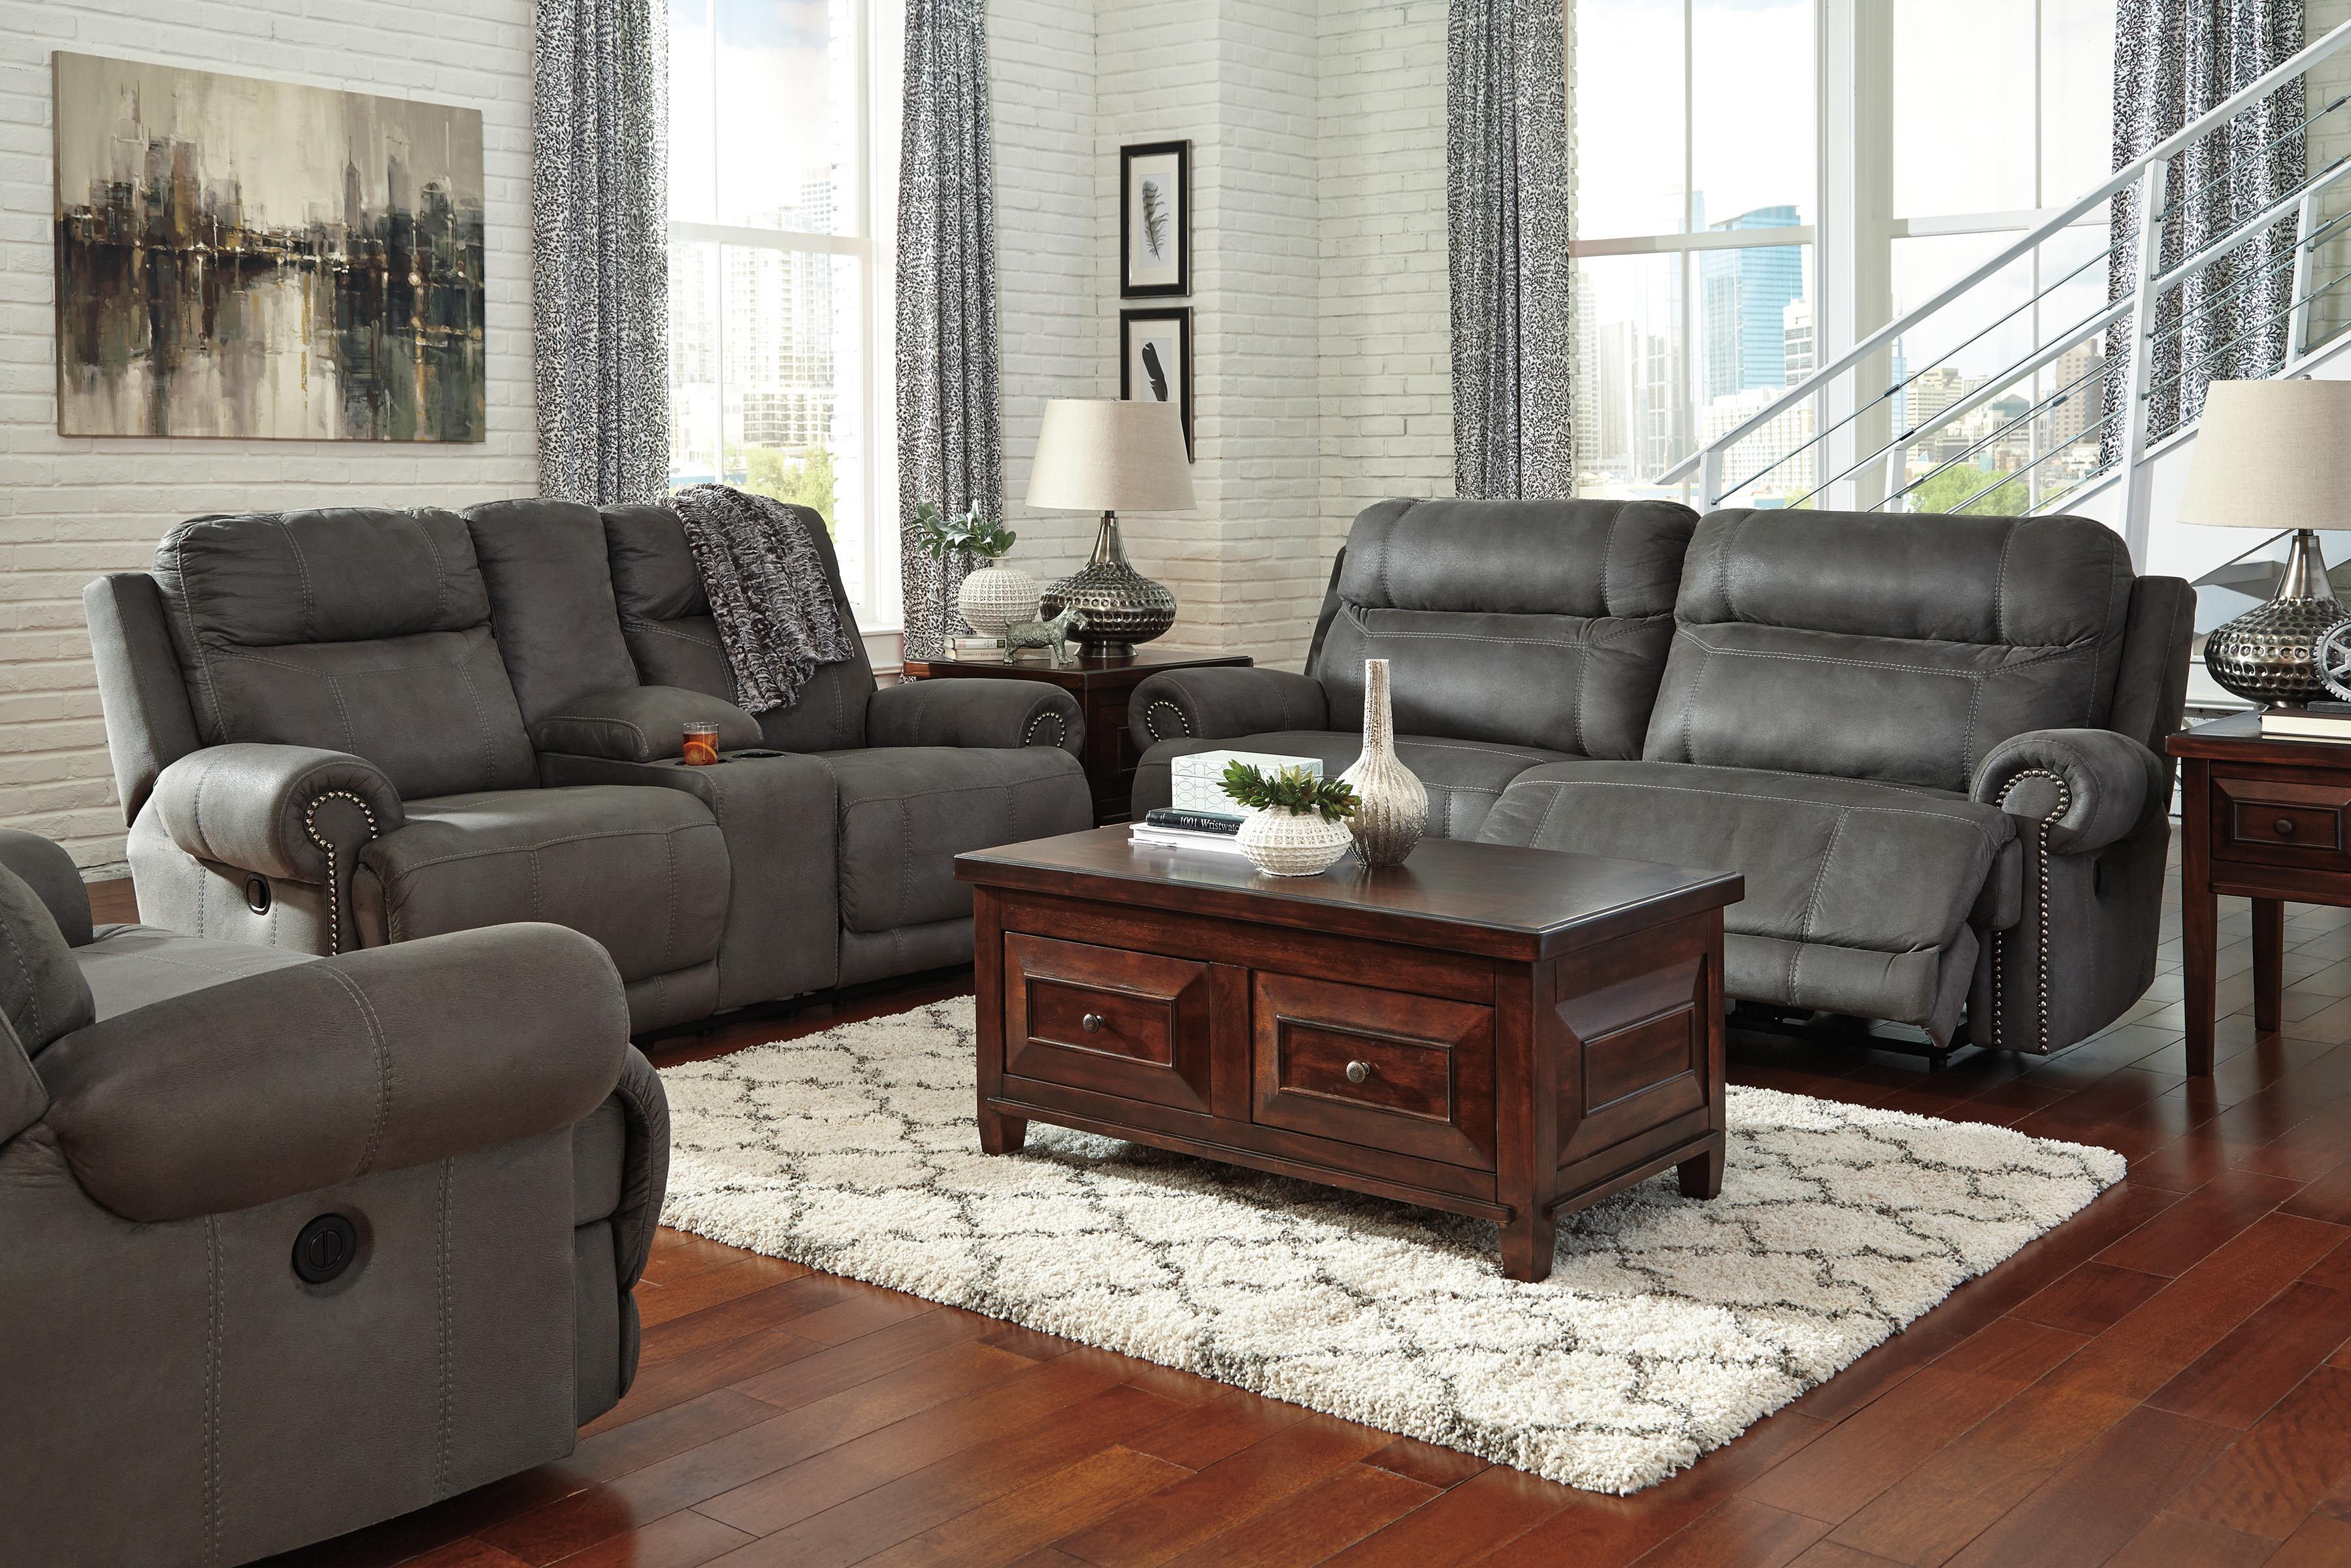 navasota charcoal sofa ashley furniture modern leather singapore 12 inspirations of gray